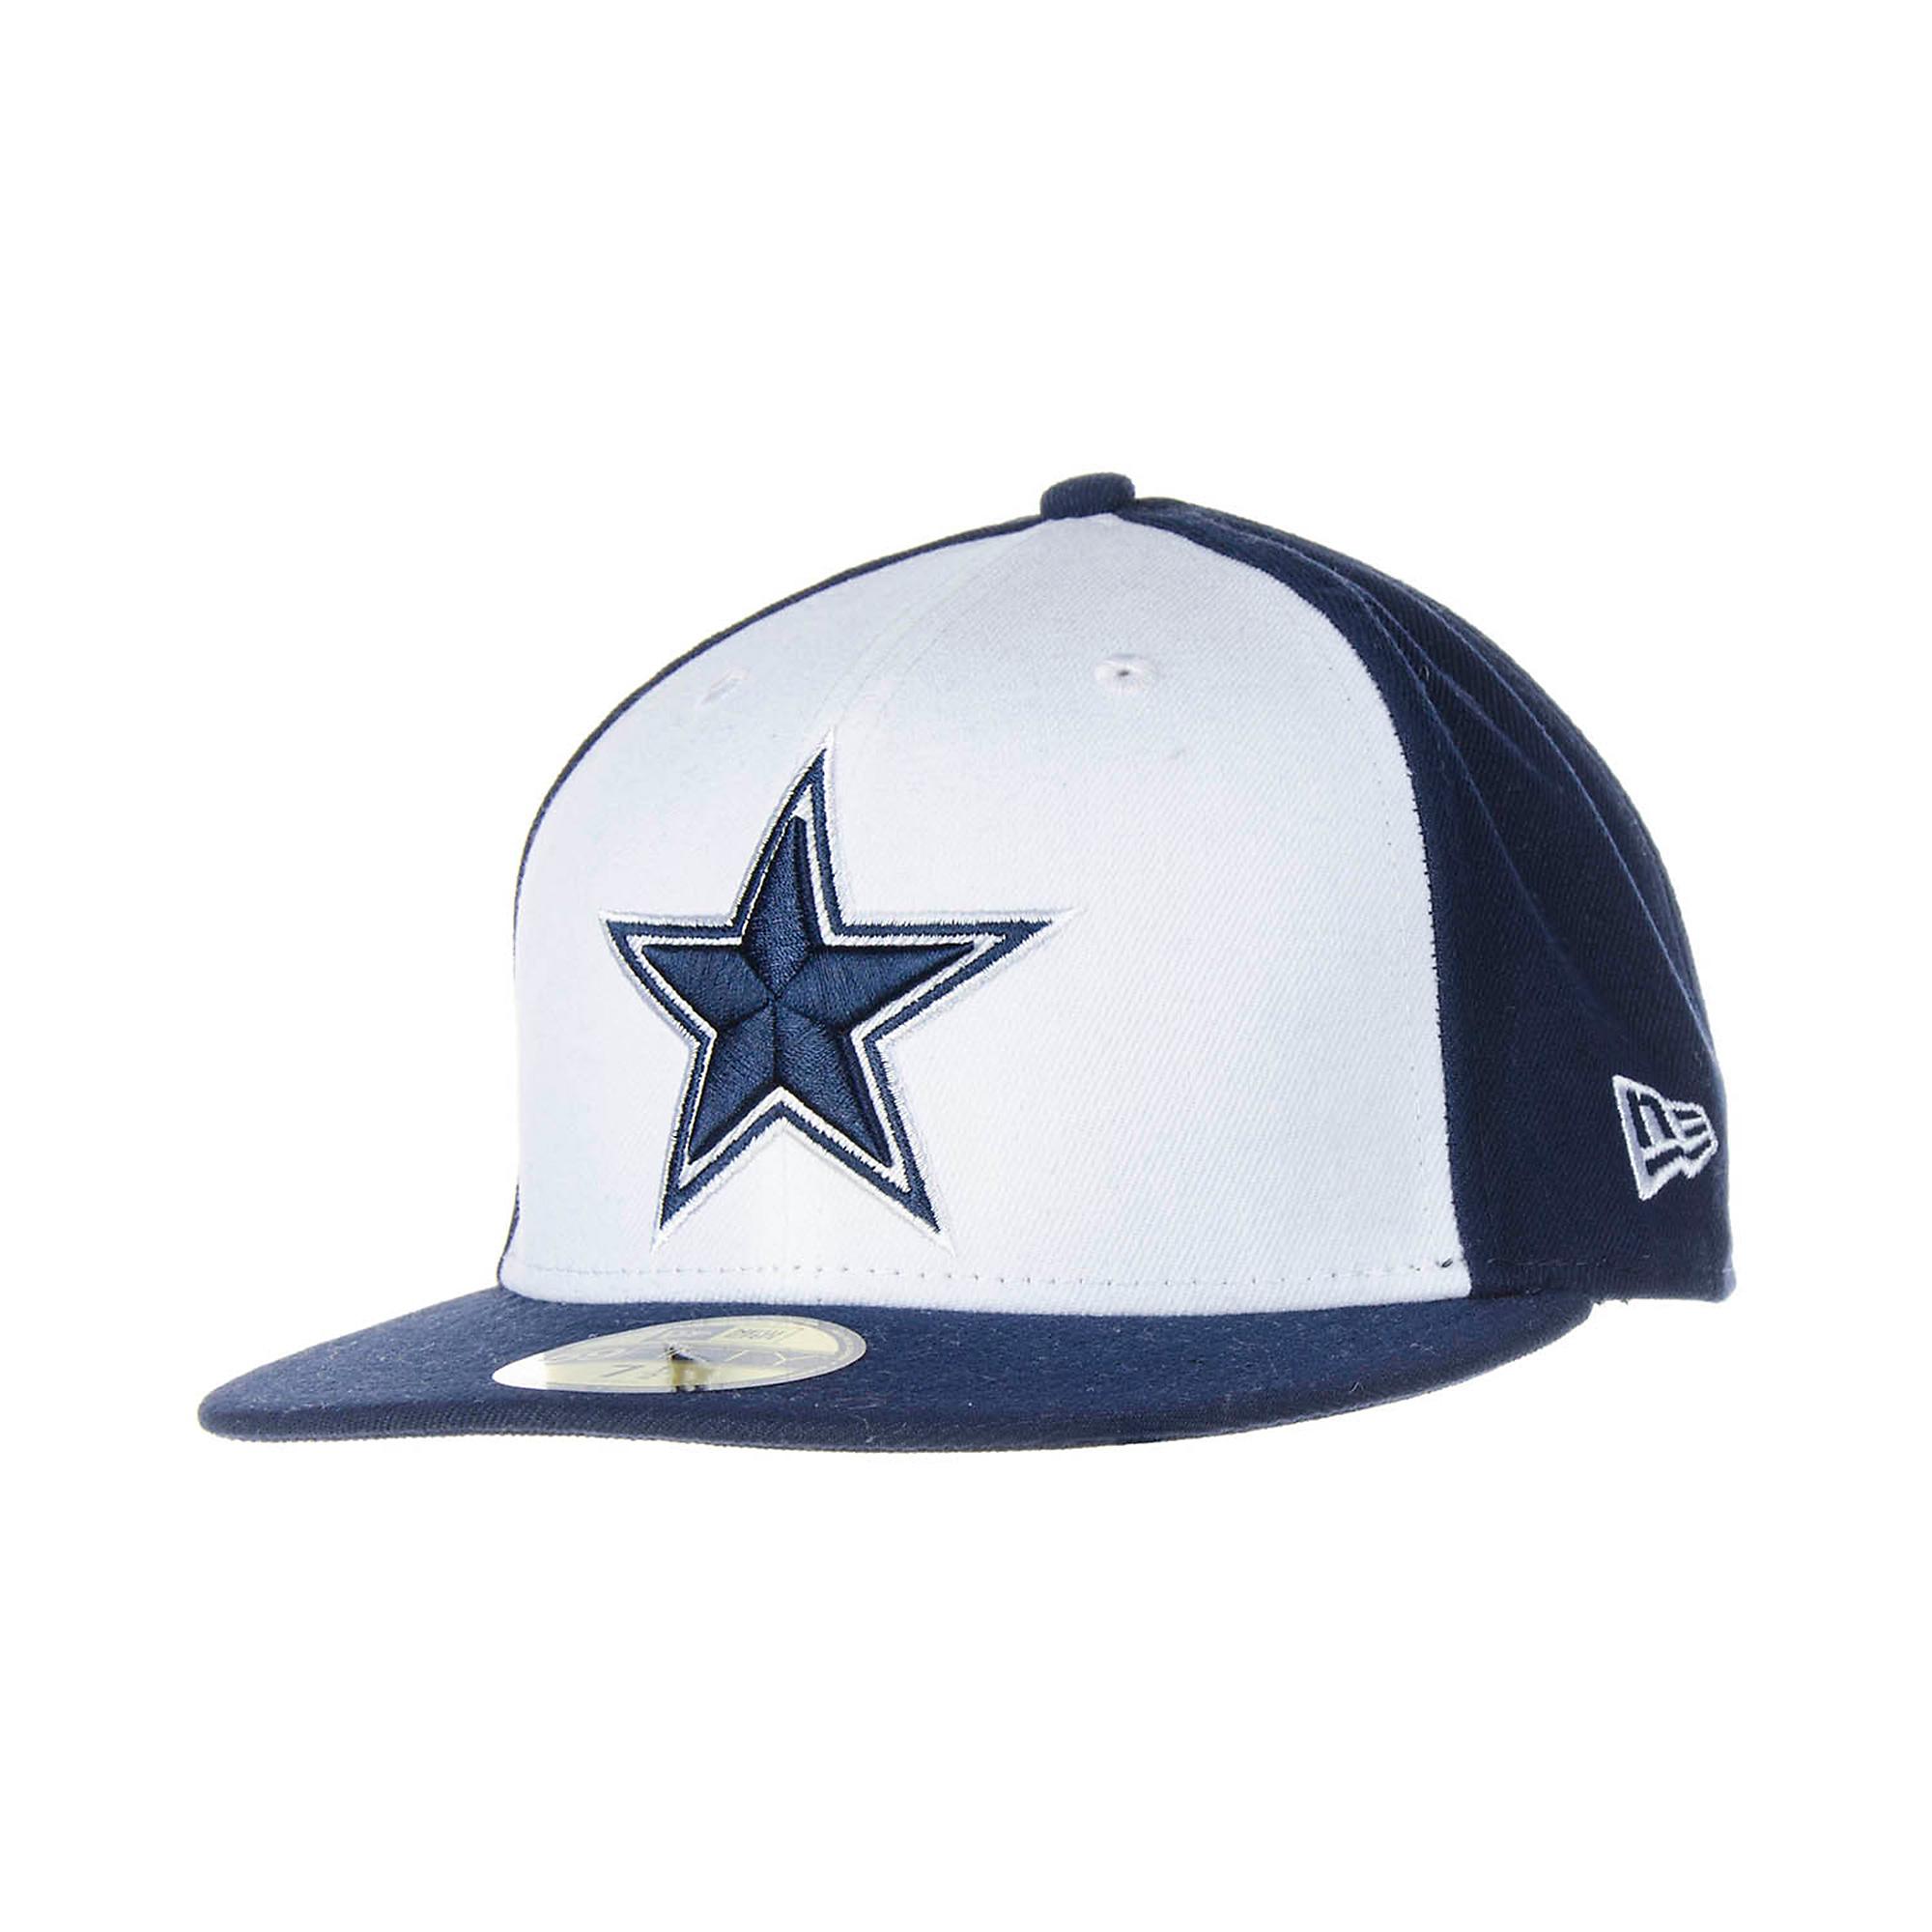 e475b573d Dallas Cowboys New Era 59Fifty Sideline Cap